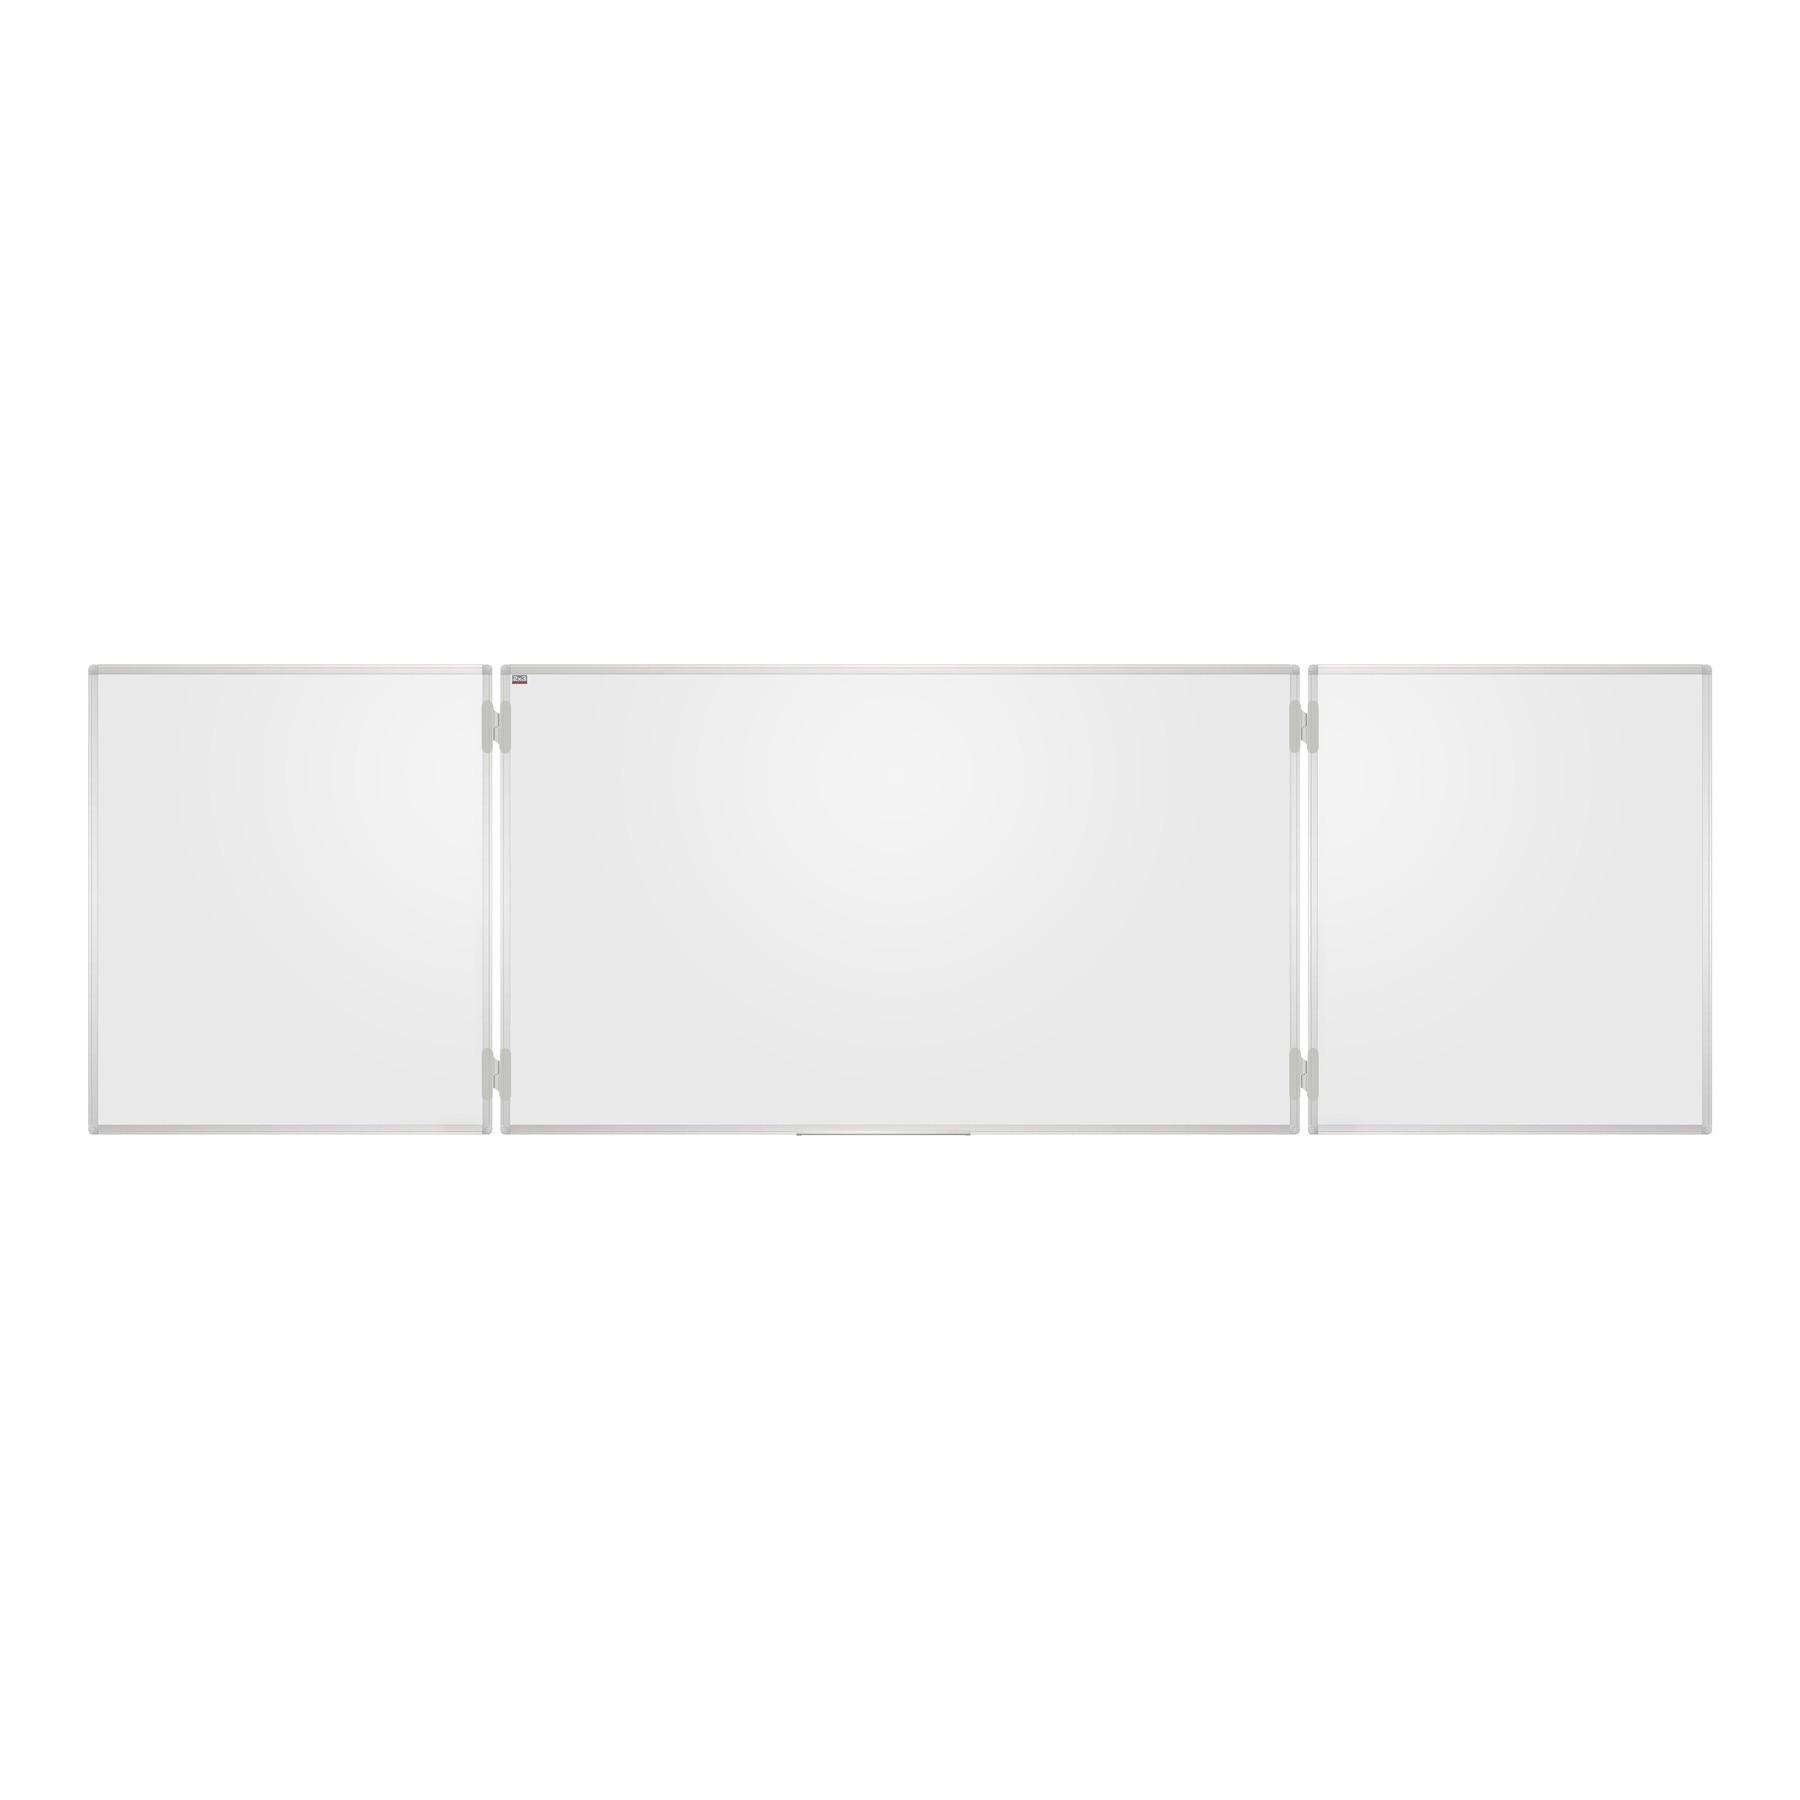 SLATE TRIPTICA VITRIFIED WHITE 400X100cm (200X100cm CLOSED)